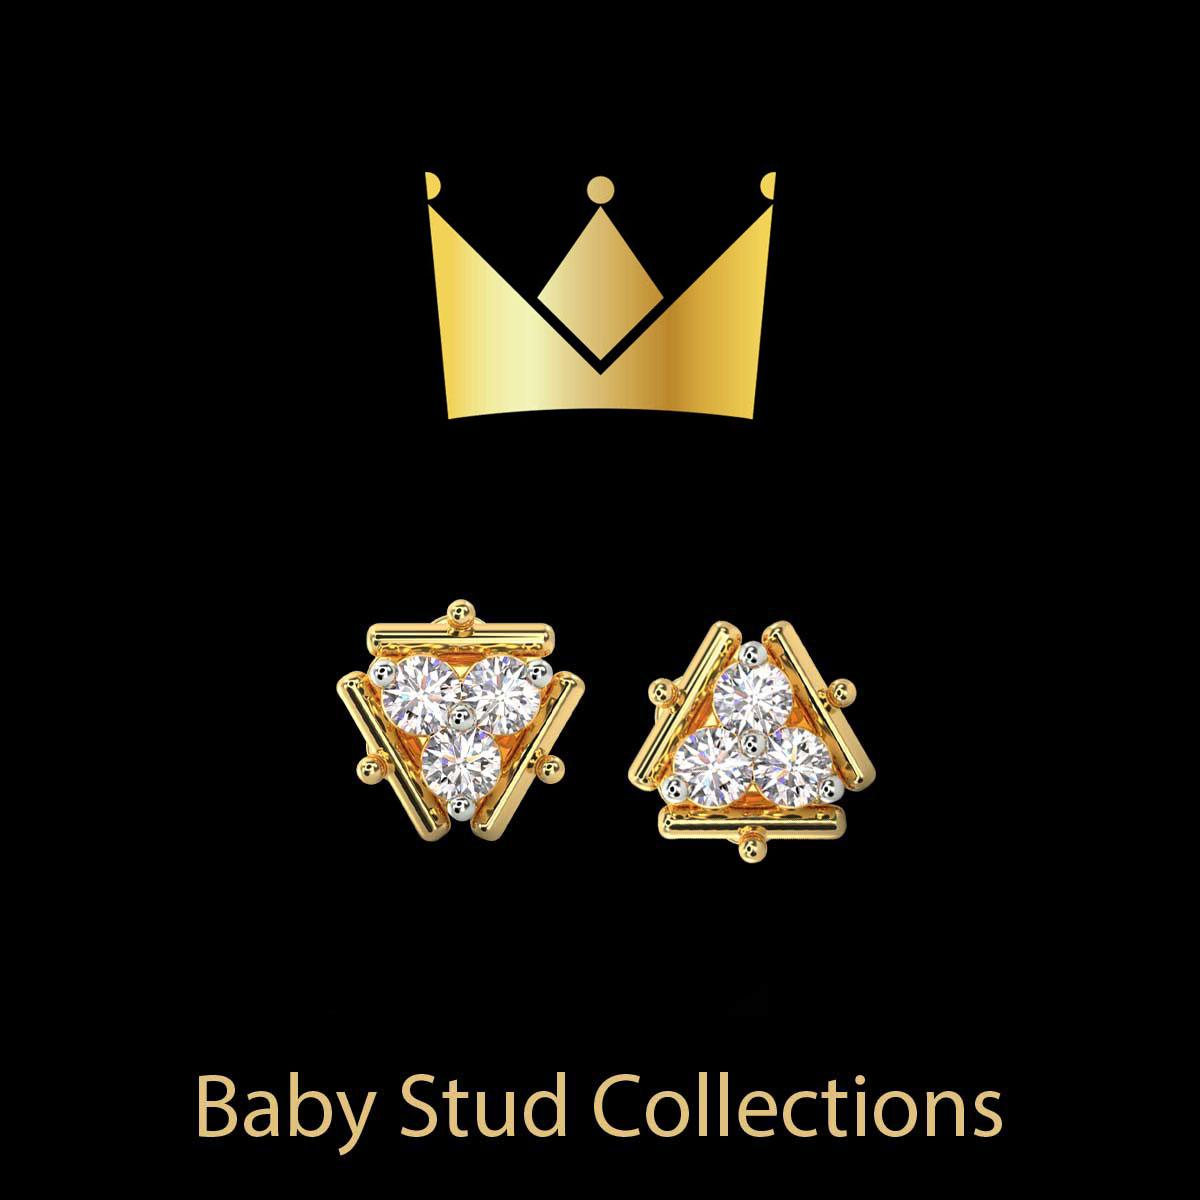 Baby Studs